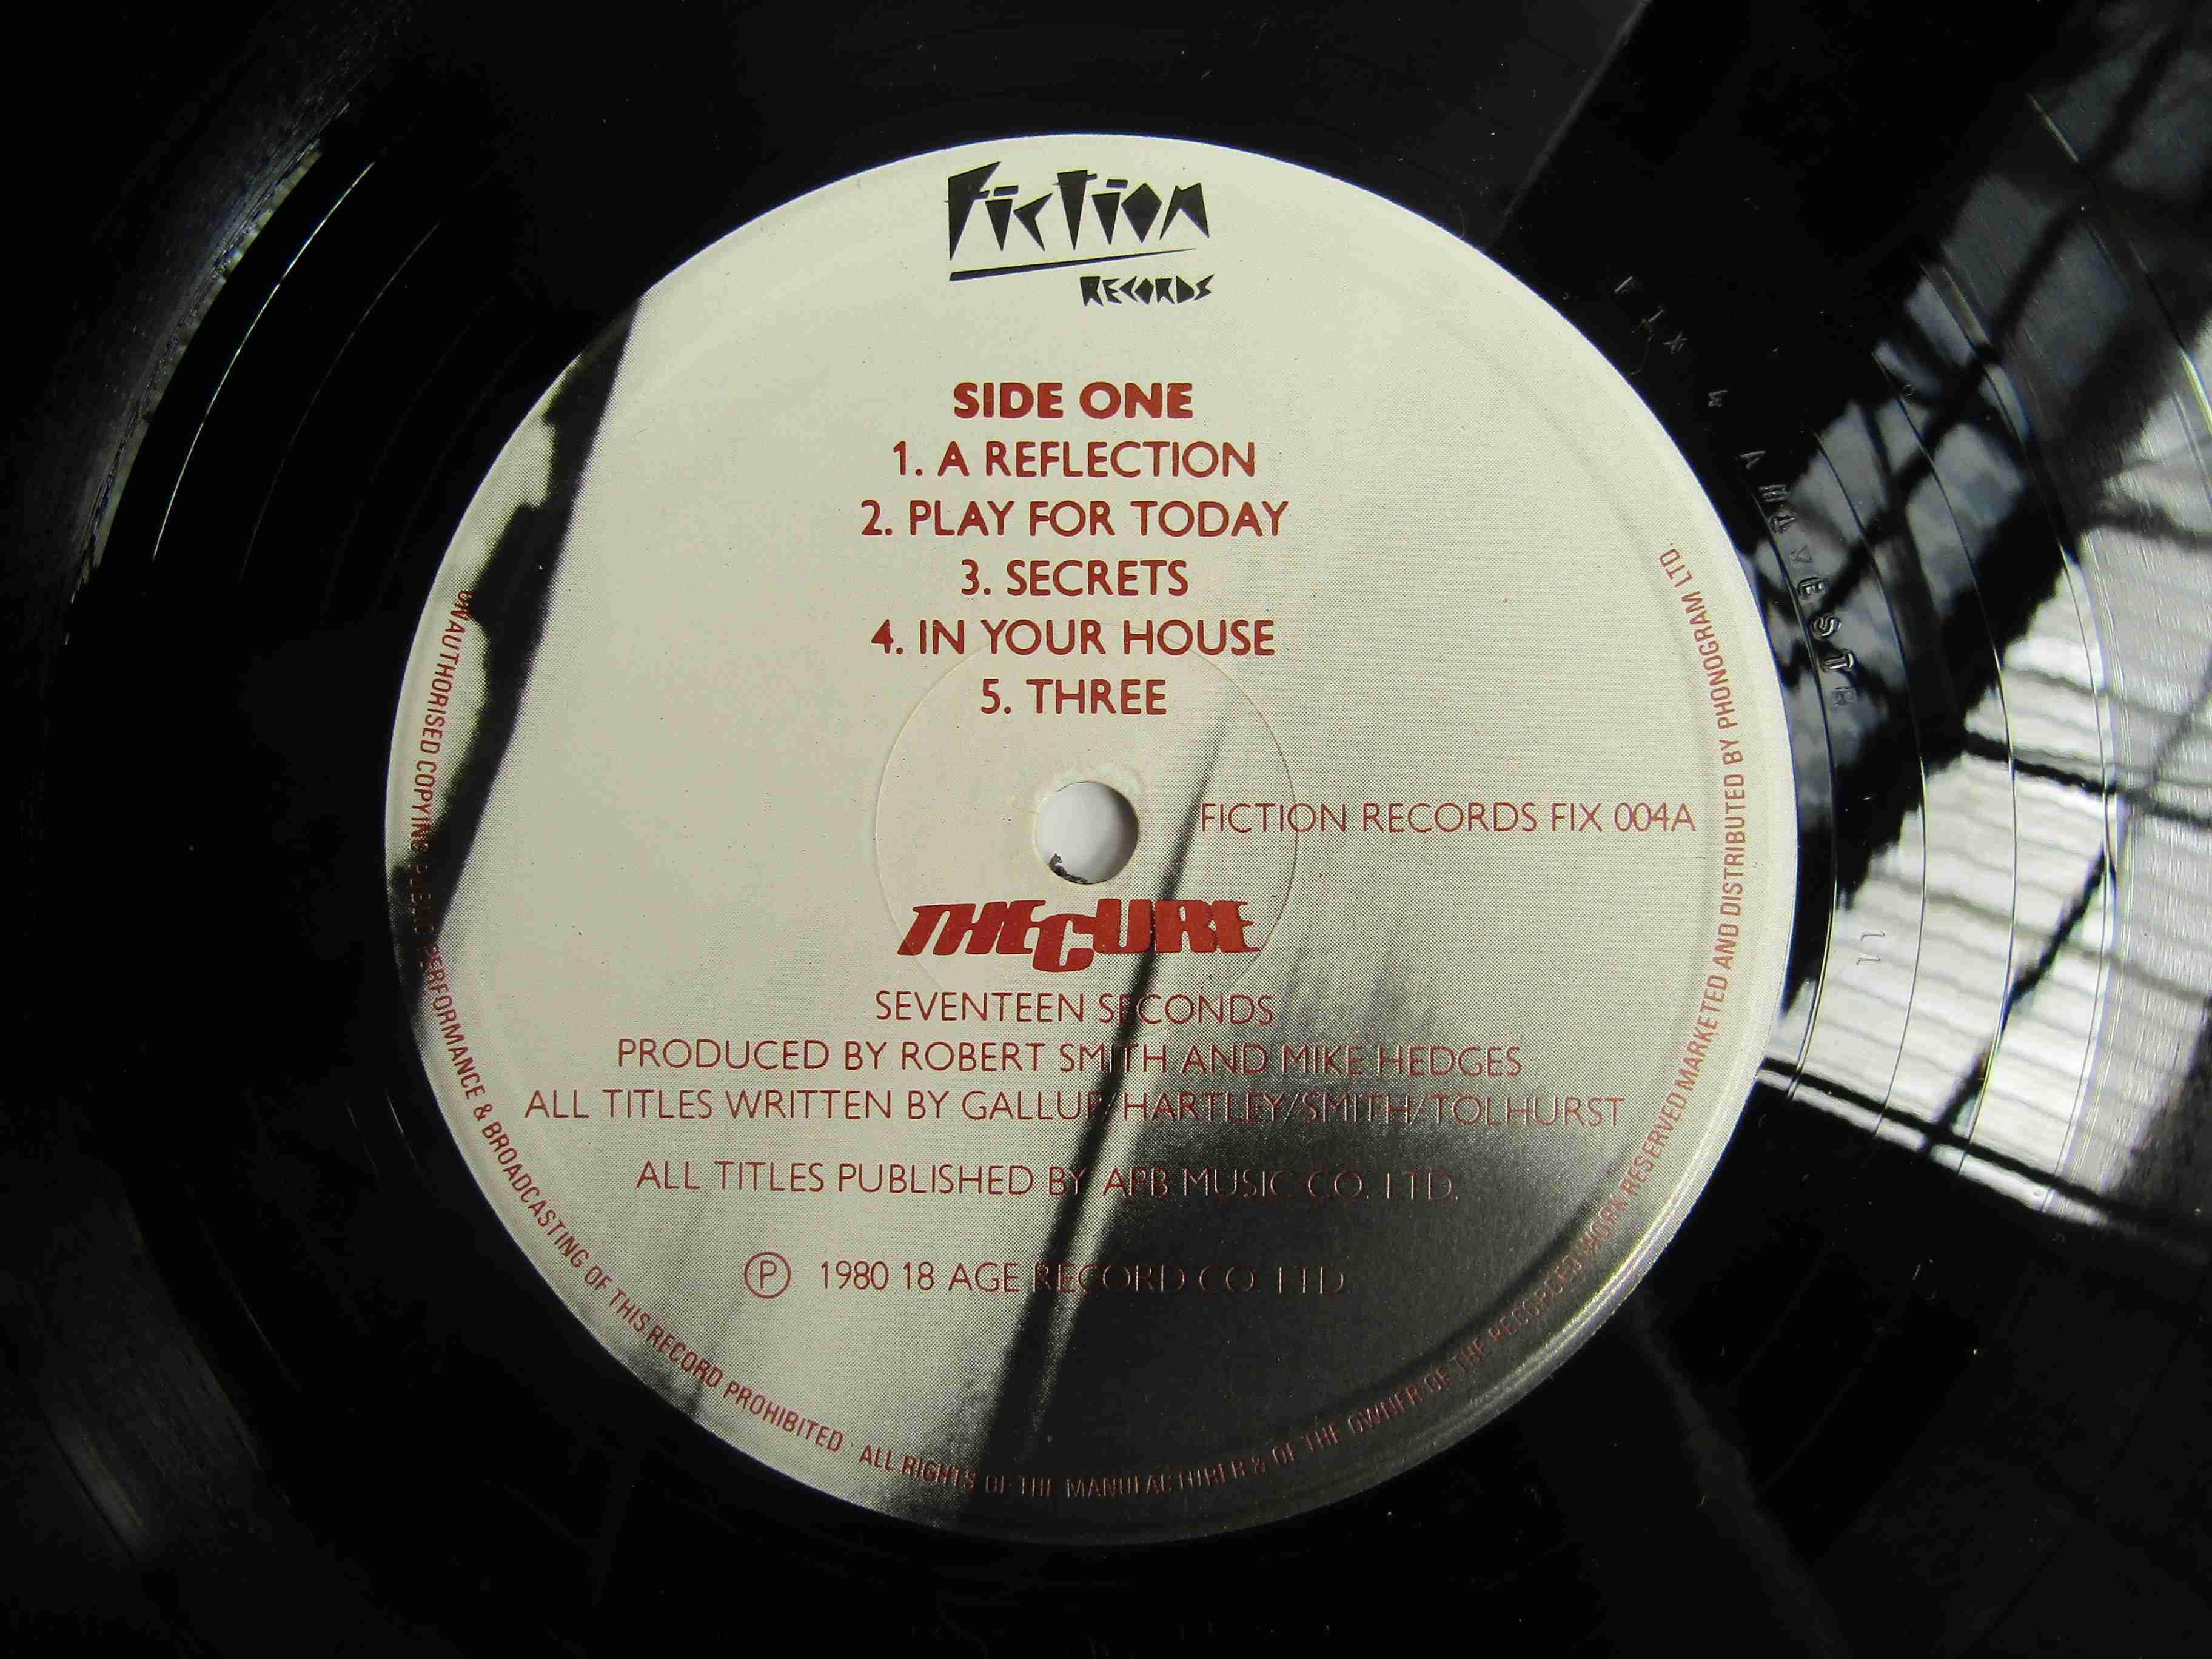 THE CURE: 'Seventeen Seconds' LP, FIX 004, - Image 2 of 2